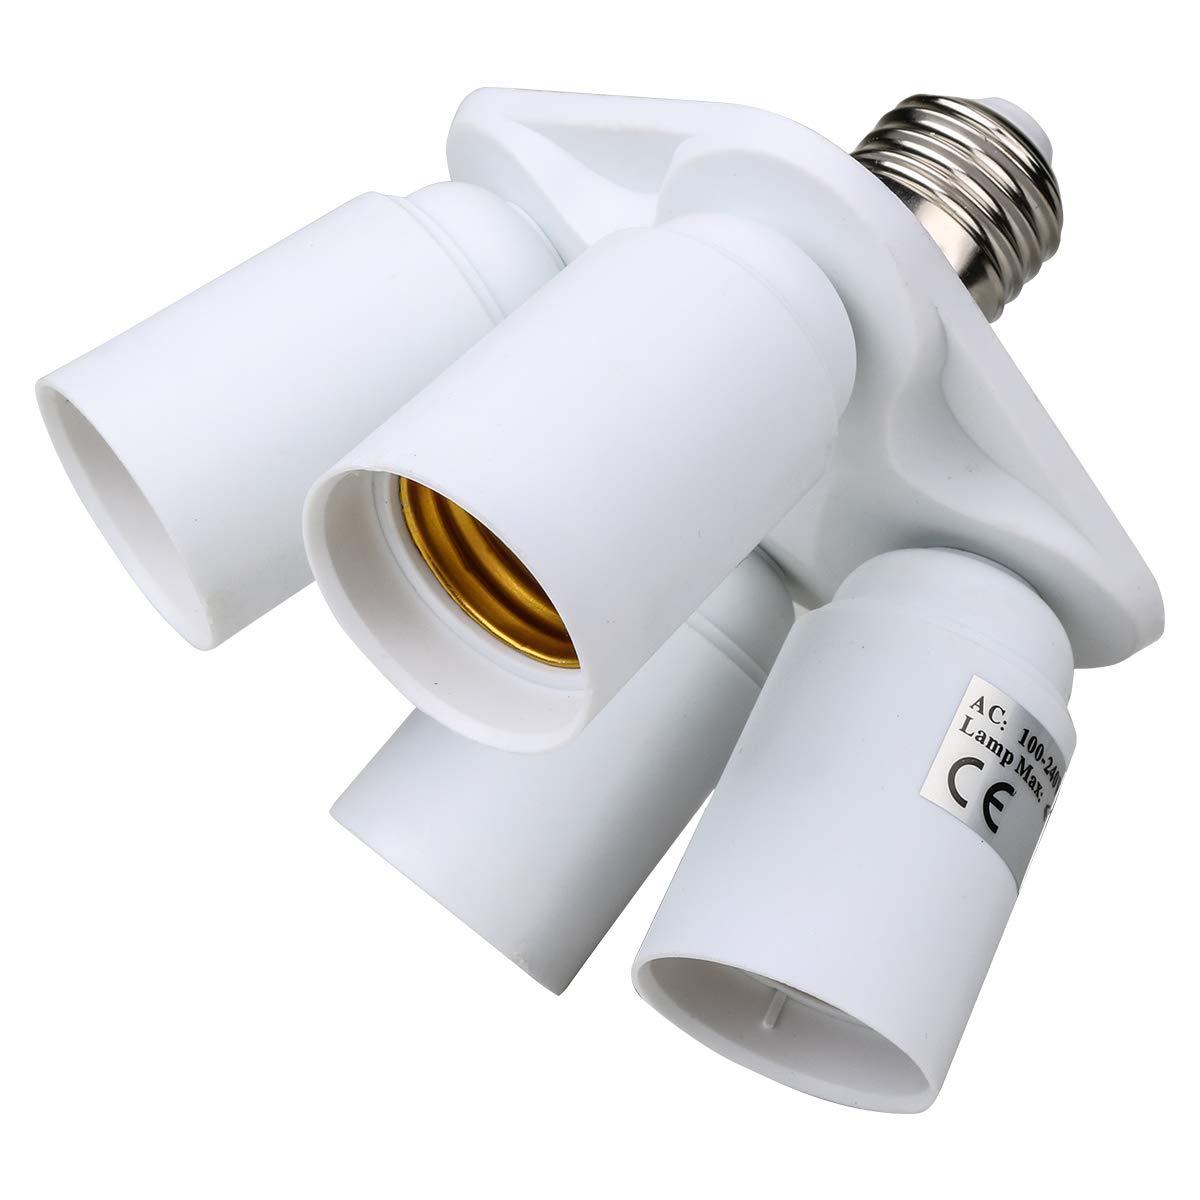 Toplimit GU10 to E12 Adapters Base Converts Fixture GU10 to Standard Screw-in Bulb Socket E12 Inflaming Retarding PBT Pack of 5 GU10 to E12